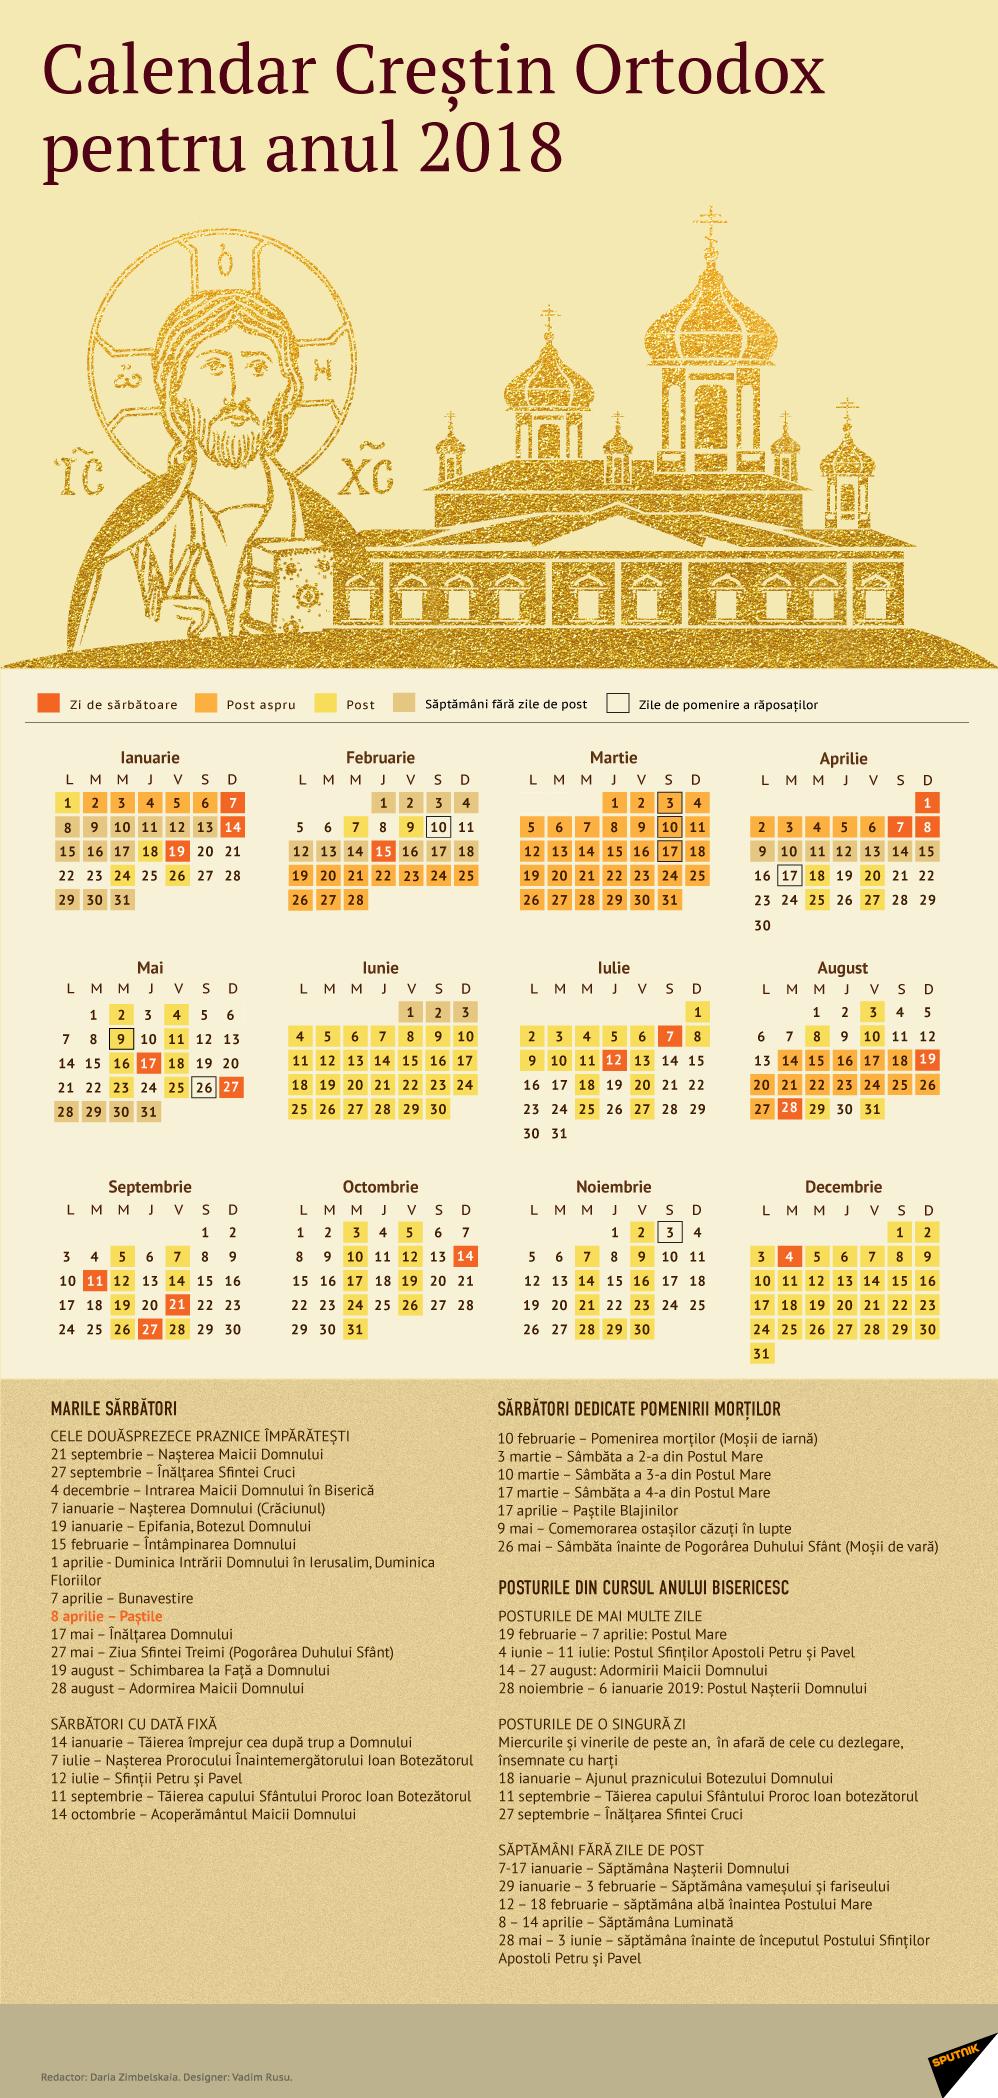 Calendar Creștin Ortodox 2018 Calendar 2019 Ortodox